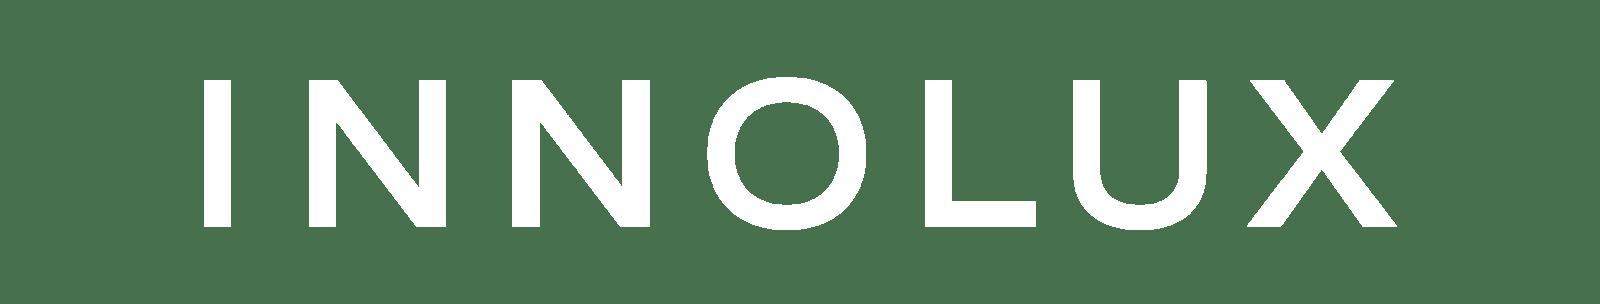 Innolux-logo